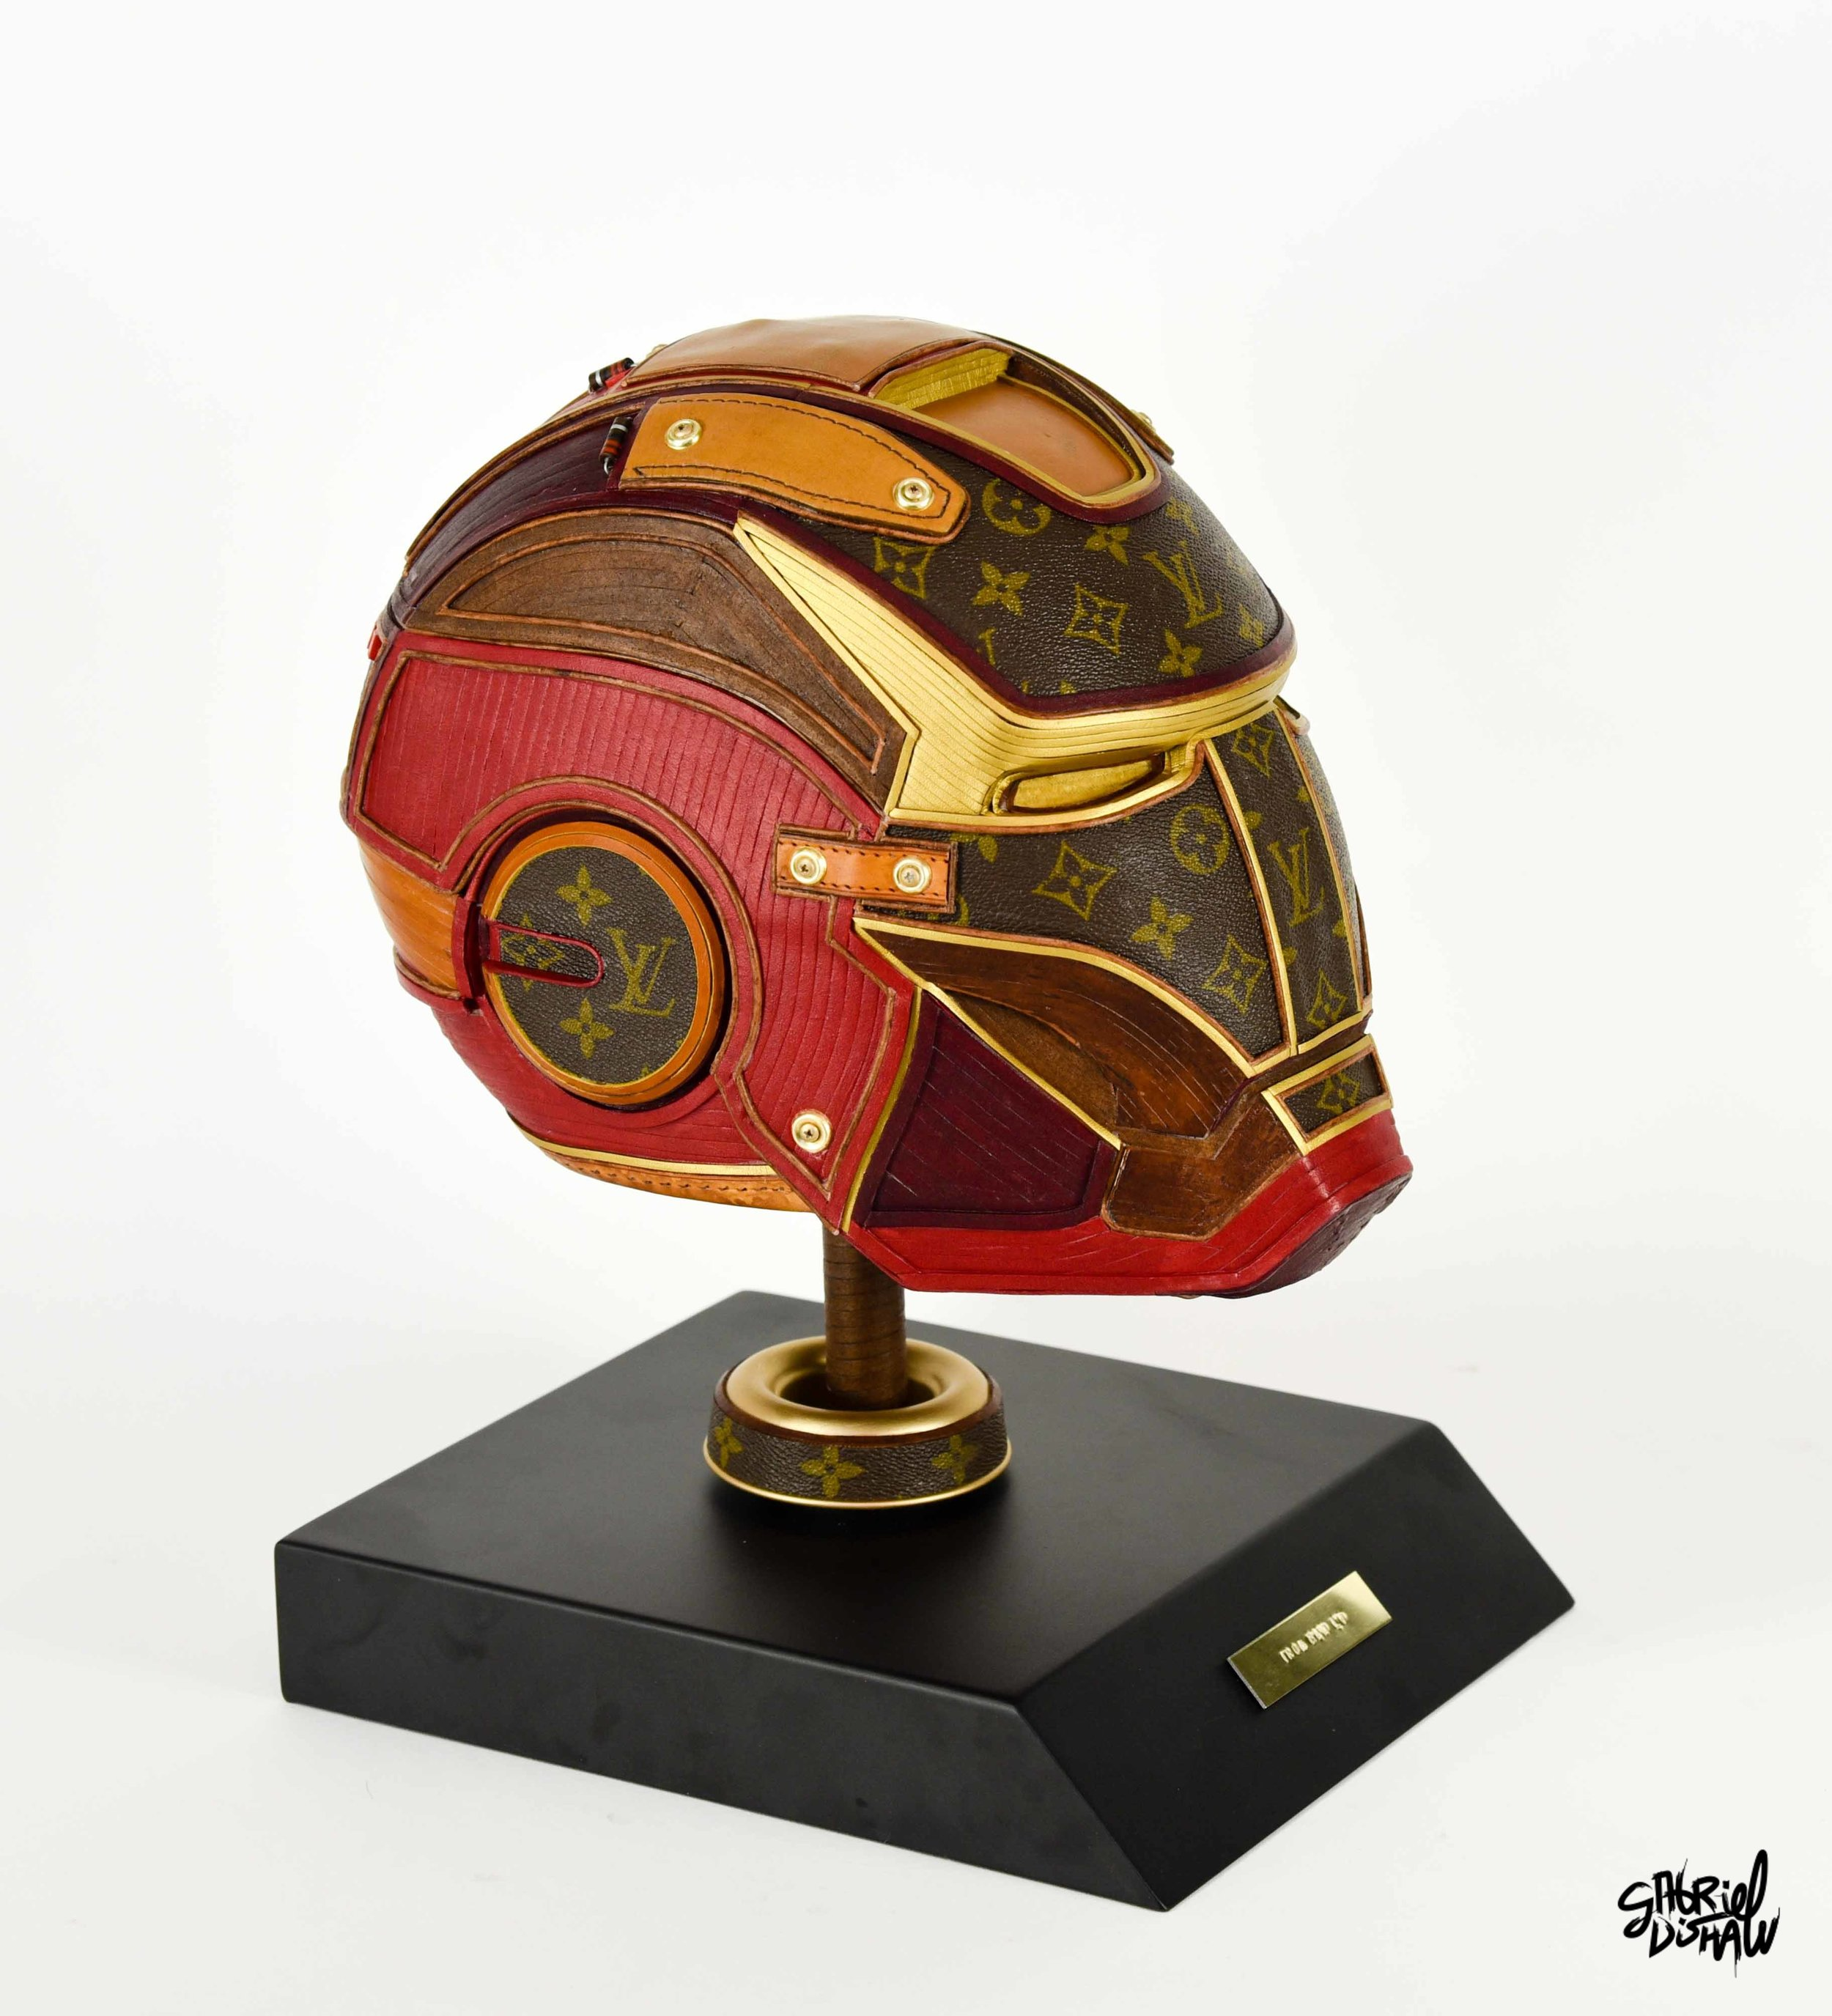 Gabriel Dishaw Iron Man LV-4131.jpg